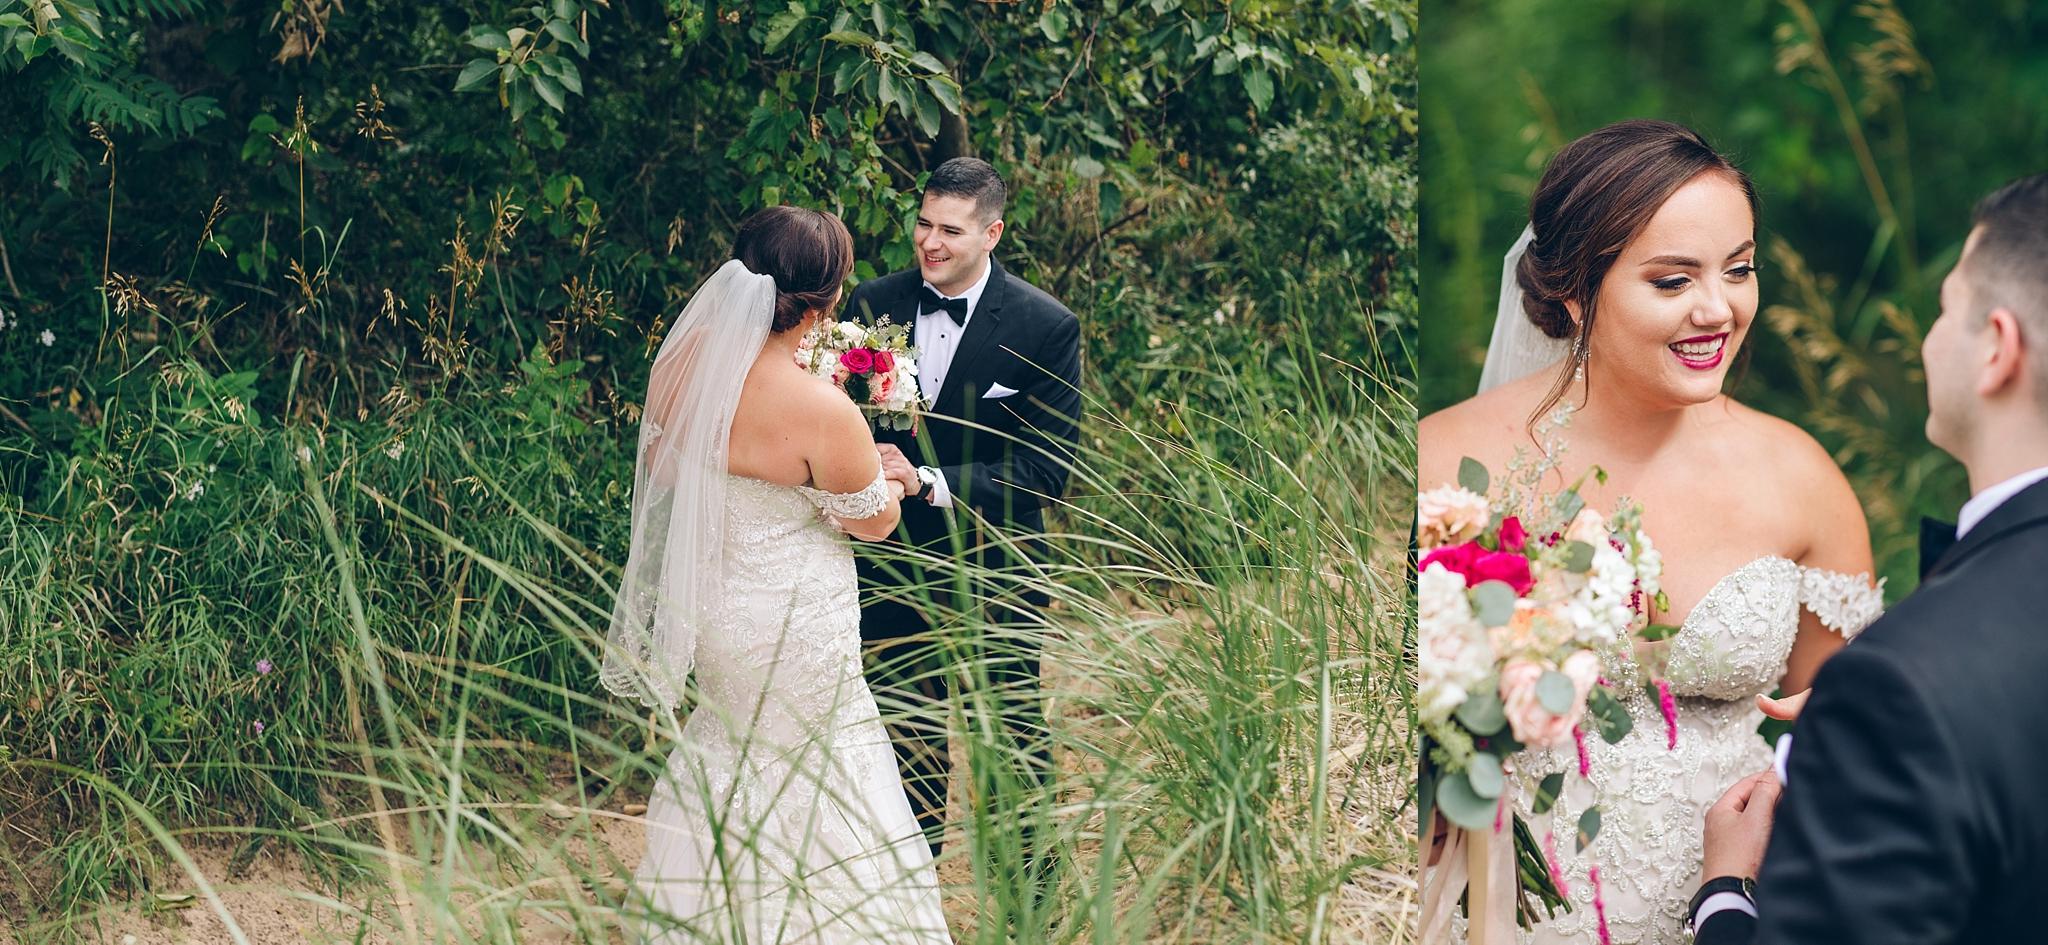 baker-lofts-holland-michigan-wedding-photographer_0334.jpg